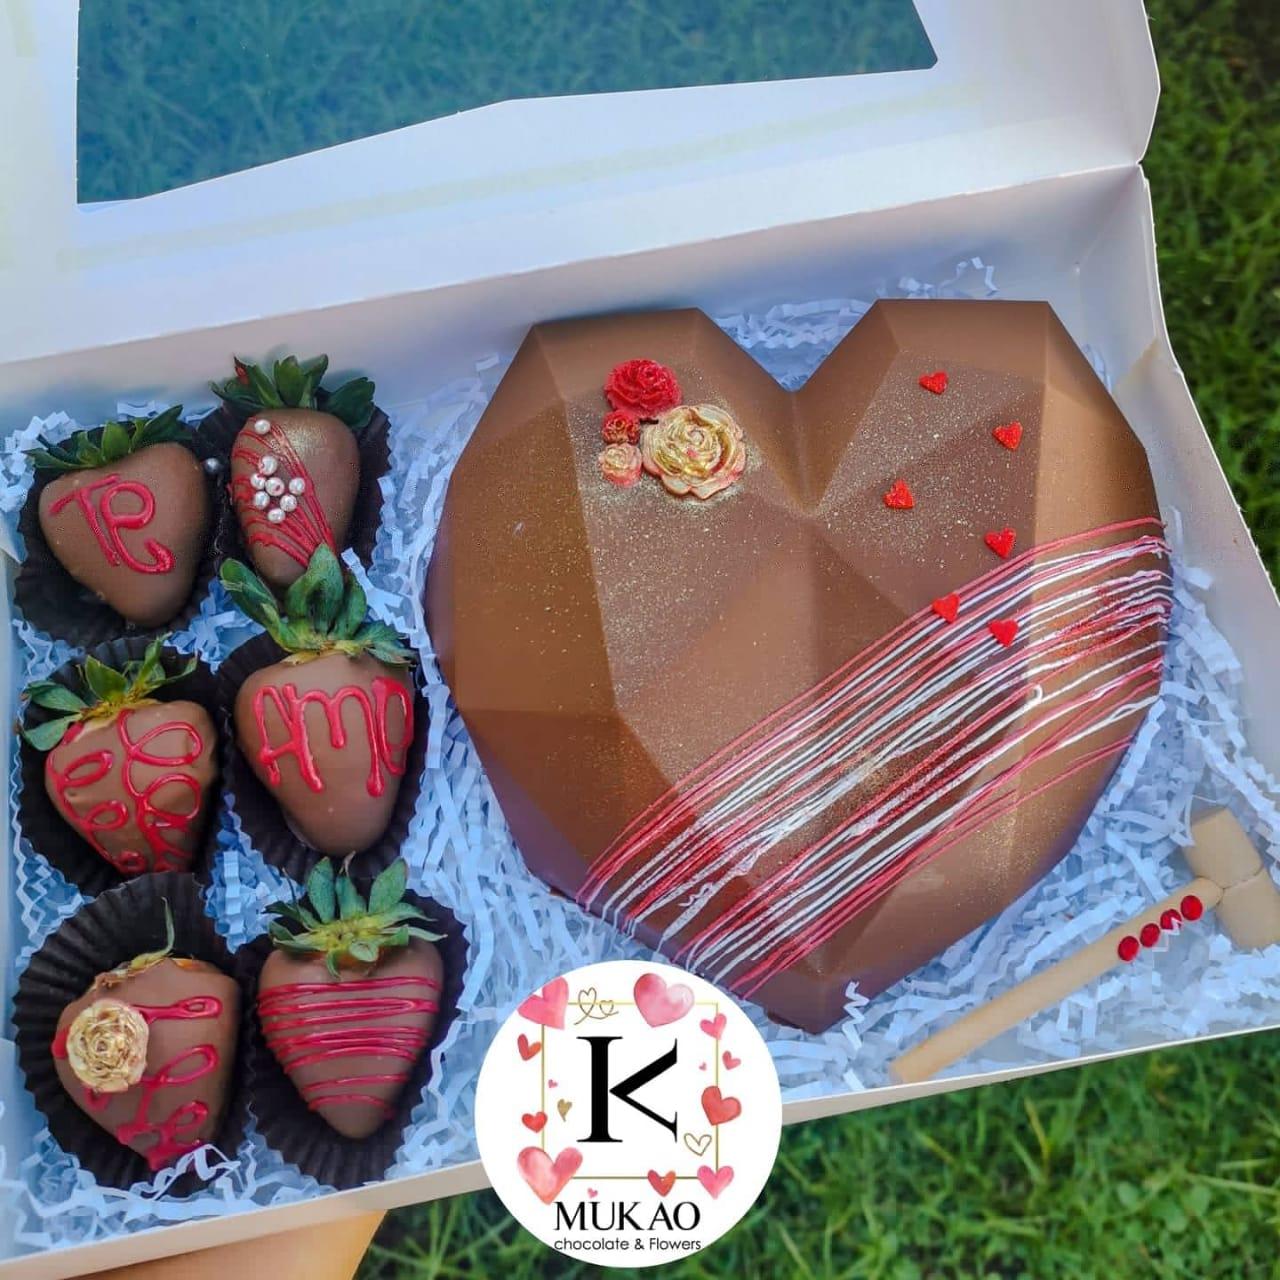 corazon-rompible-con-fresas-con-chocolate